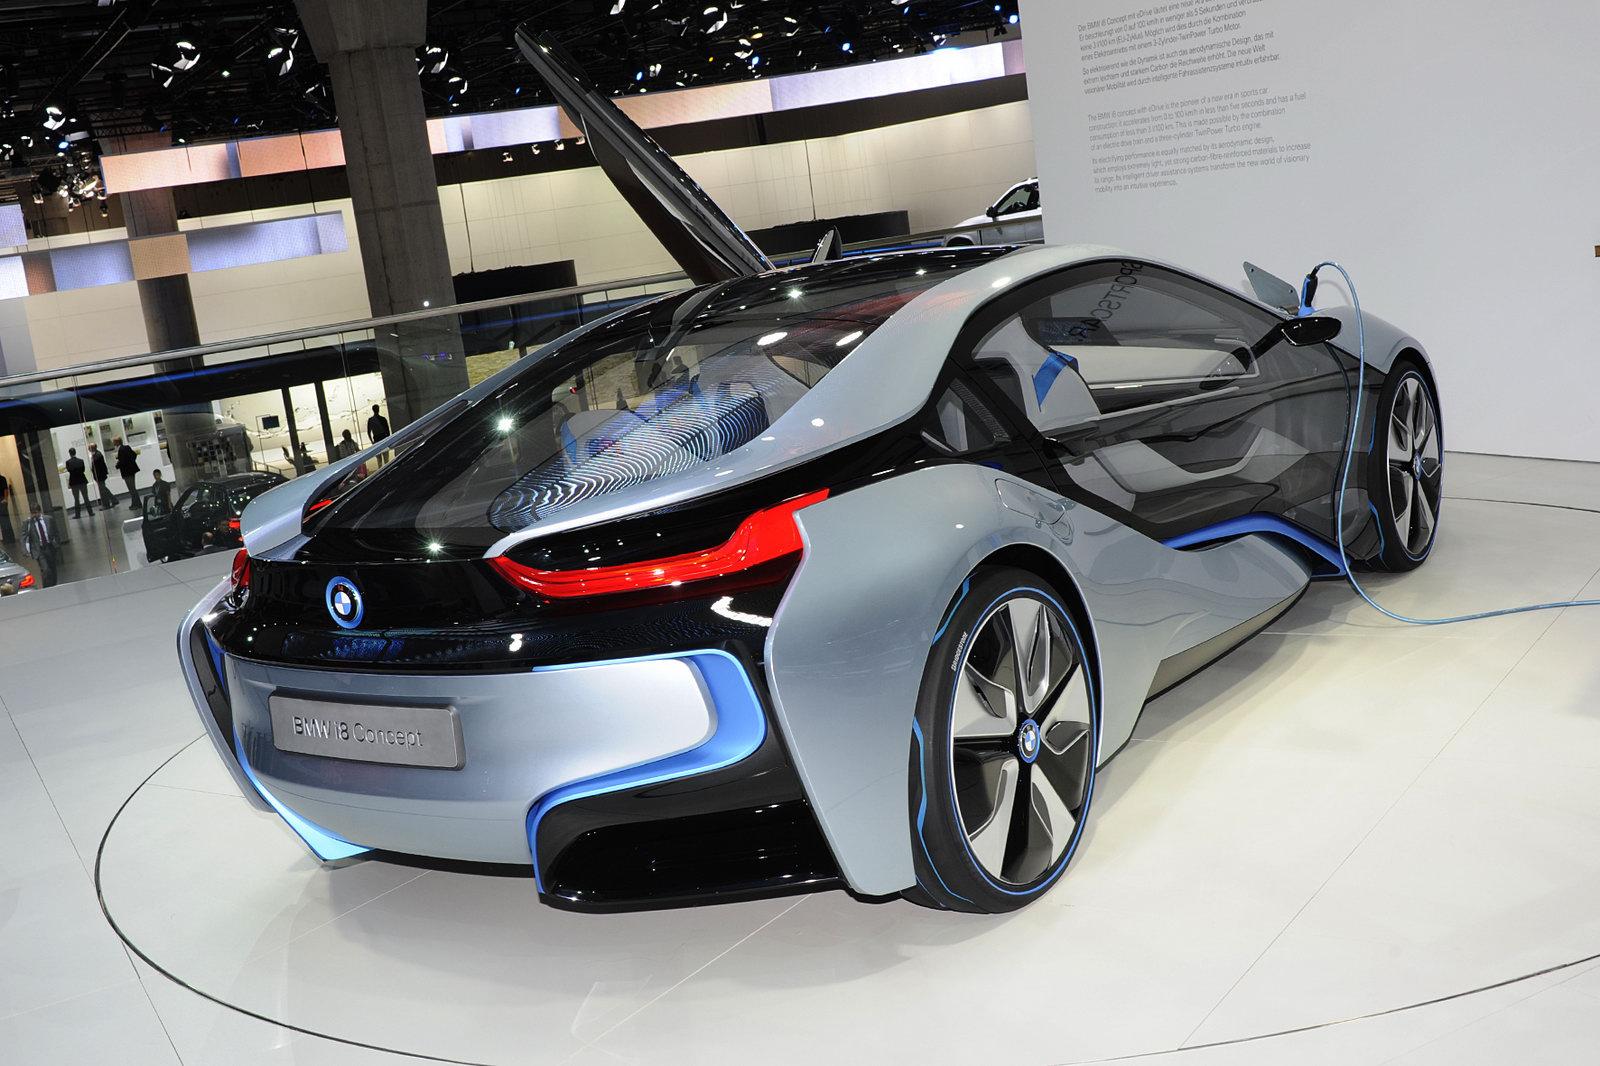 http://1.bp.blogspot.com/-tSTkiBiQK_4/TuDTHrovTgI/AAAAAAAABWg/1WZQGBhQkLg/s1600/2013-BMW-i8-98.jpg